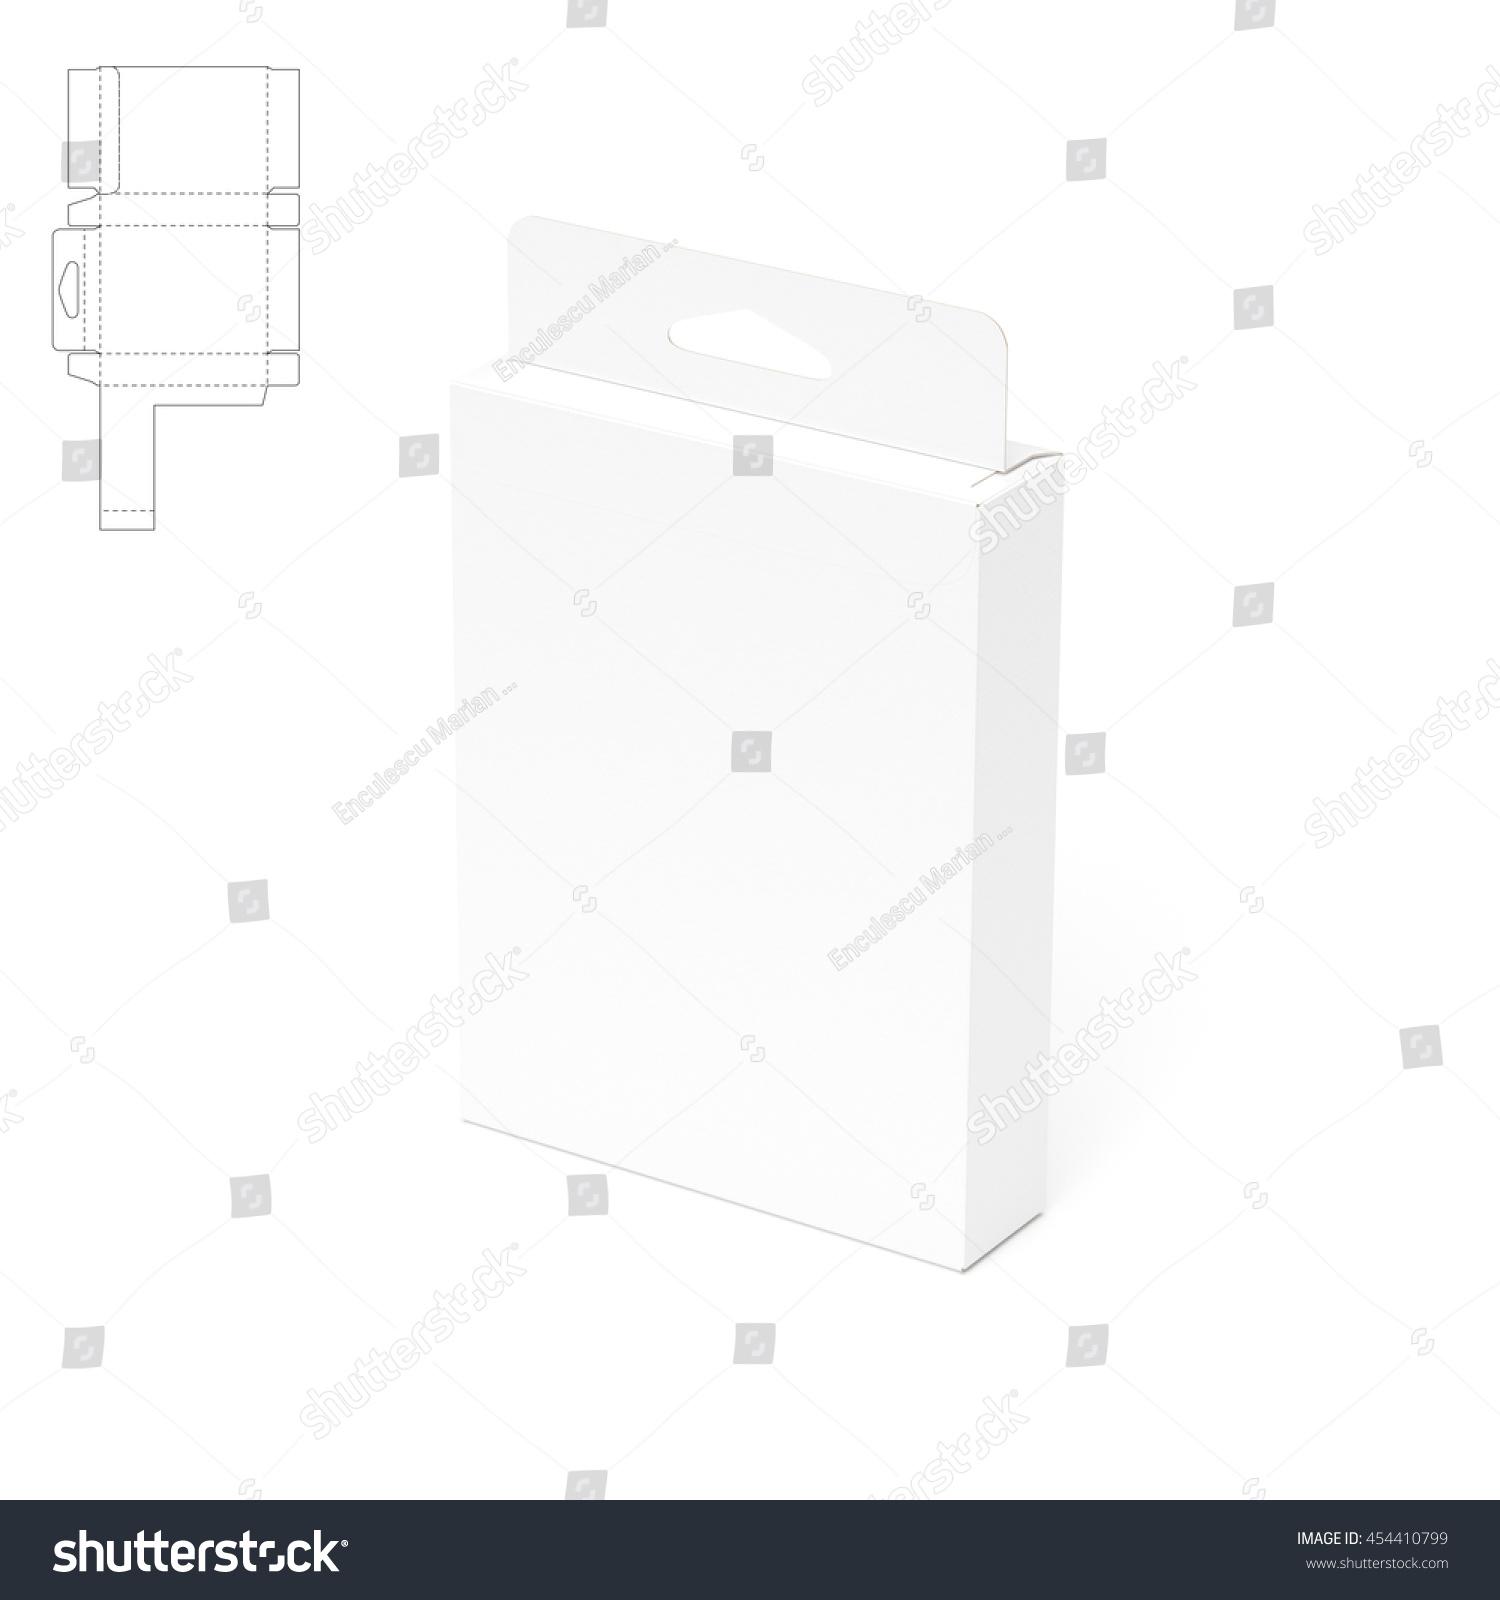 Tear off slim box blueprint 3 d stock illustration 454410799 tear off slim box with blueprint 3d rendering malvernweather Choice Image